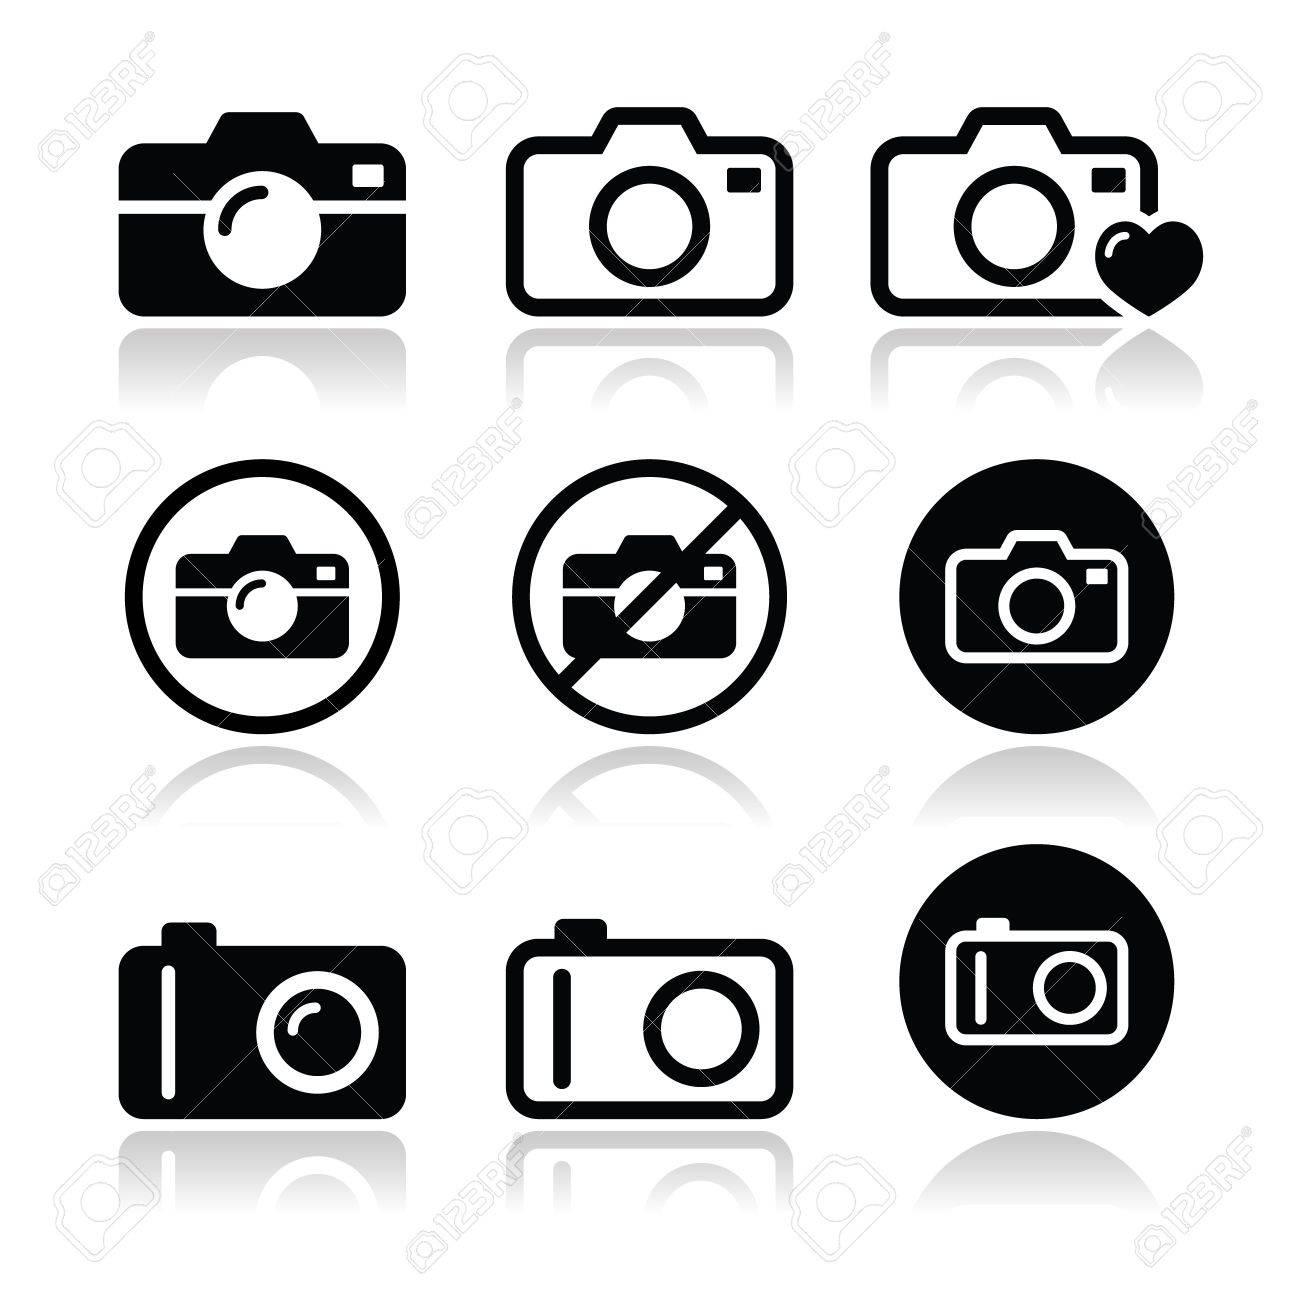 Camera icons set - 21213222